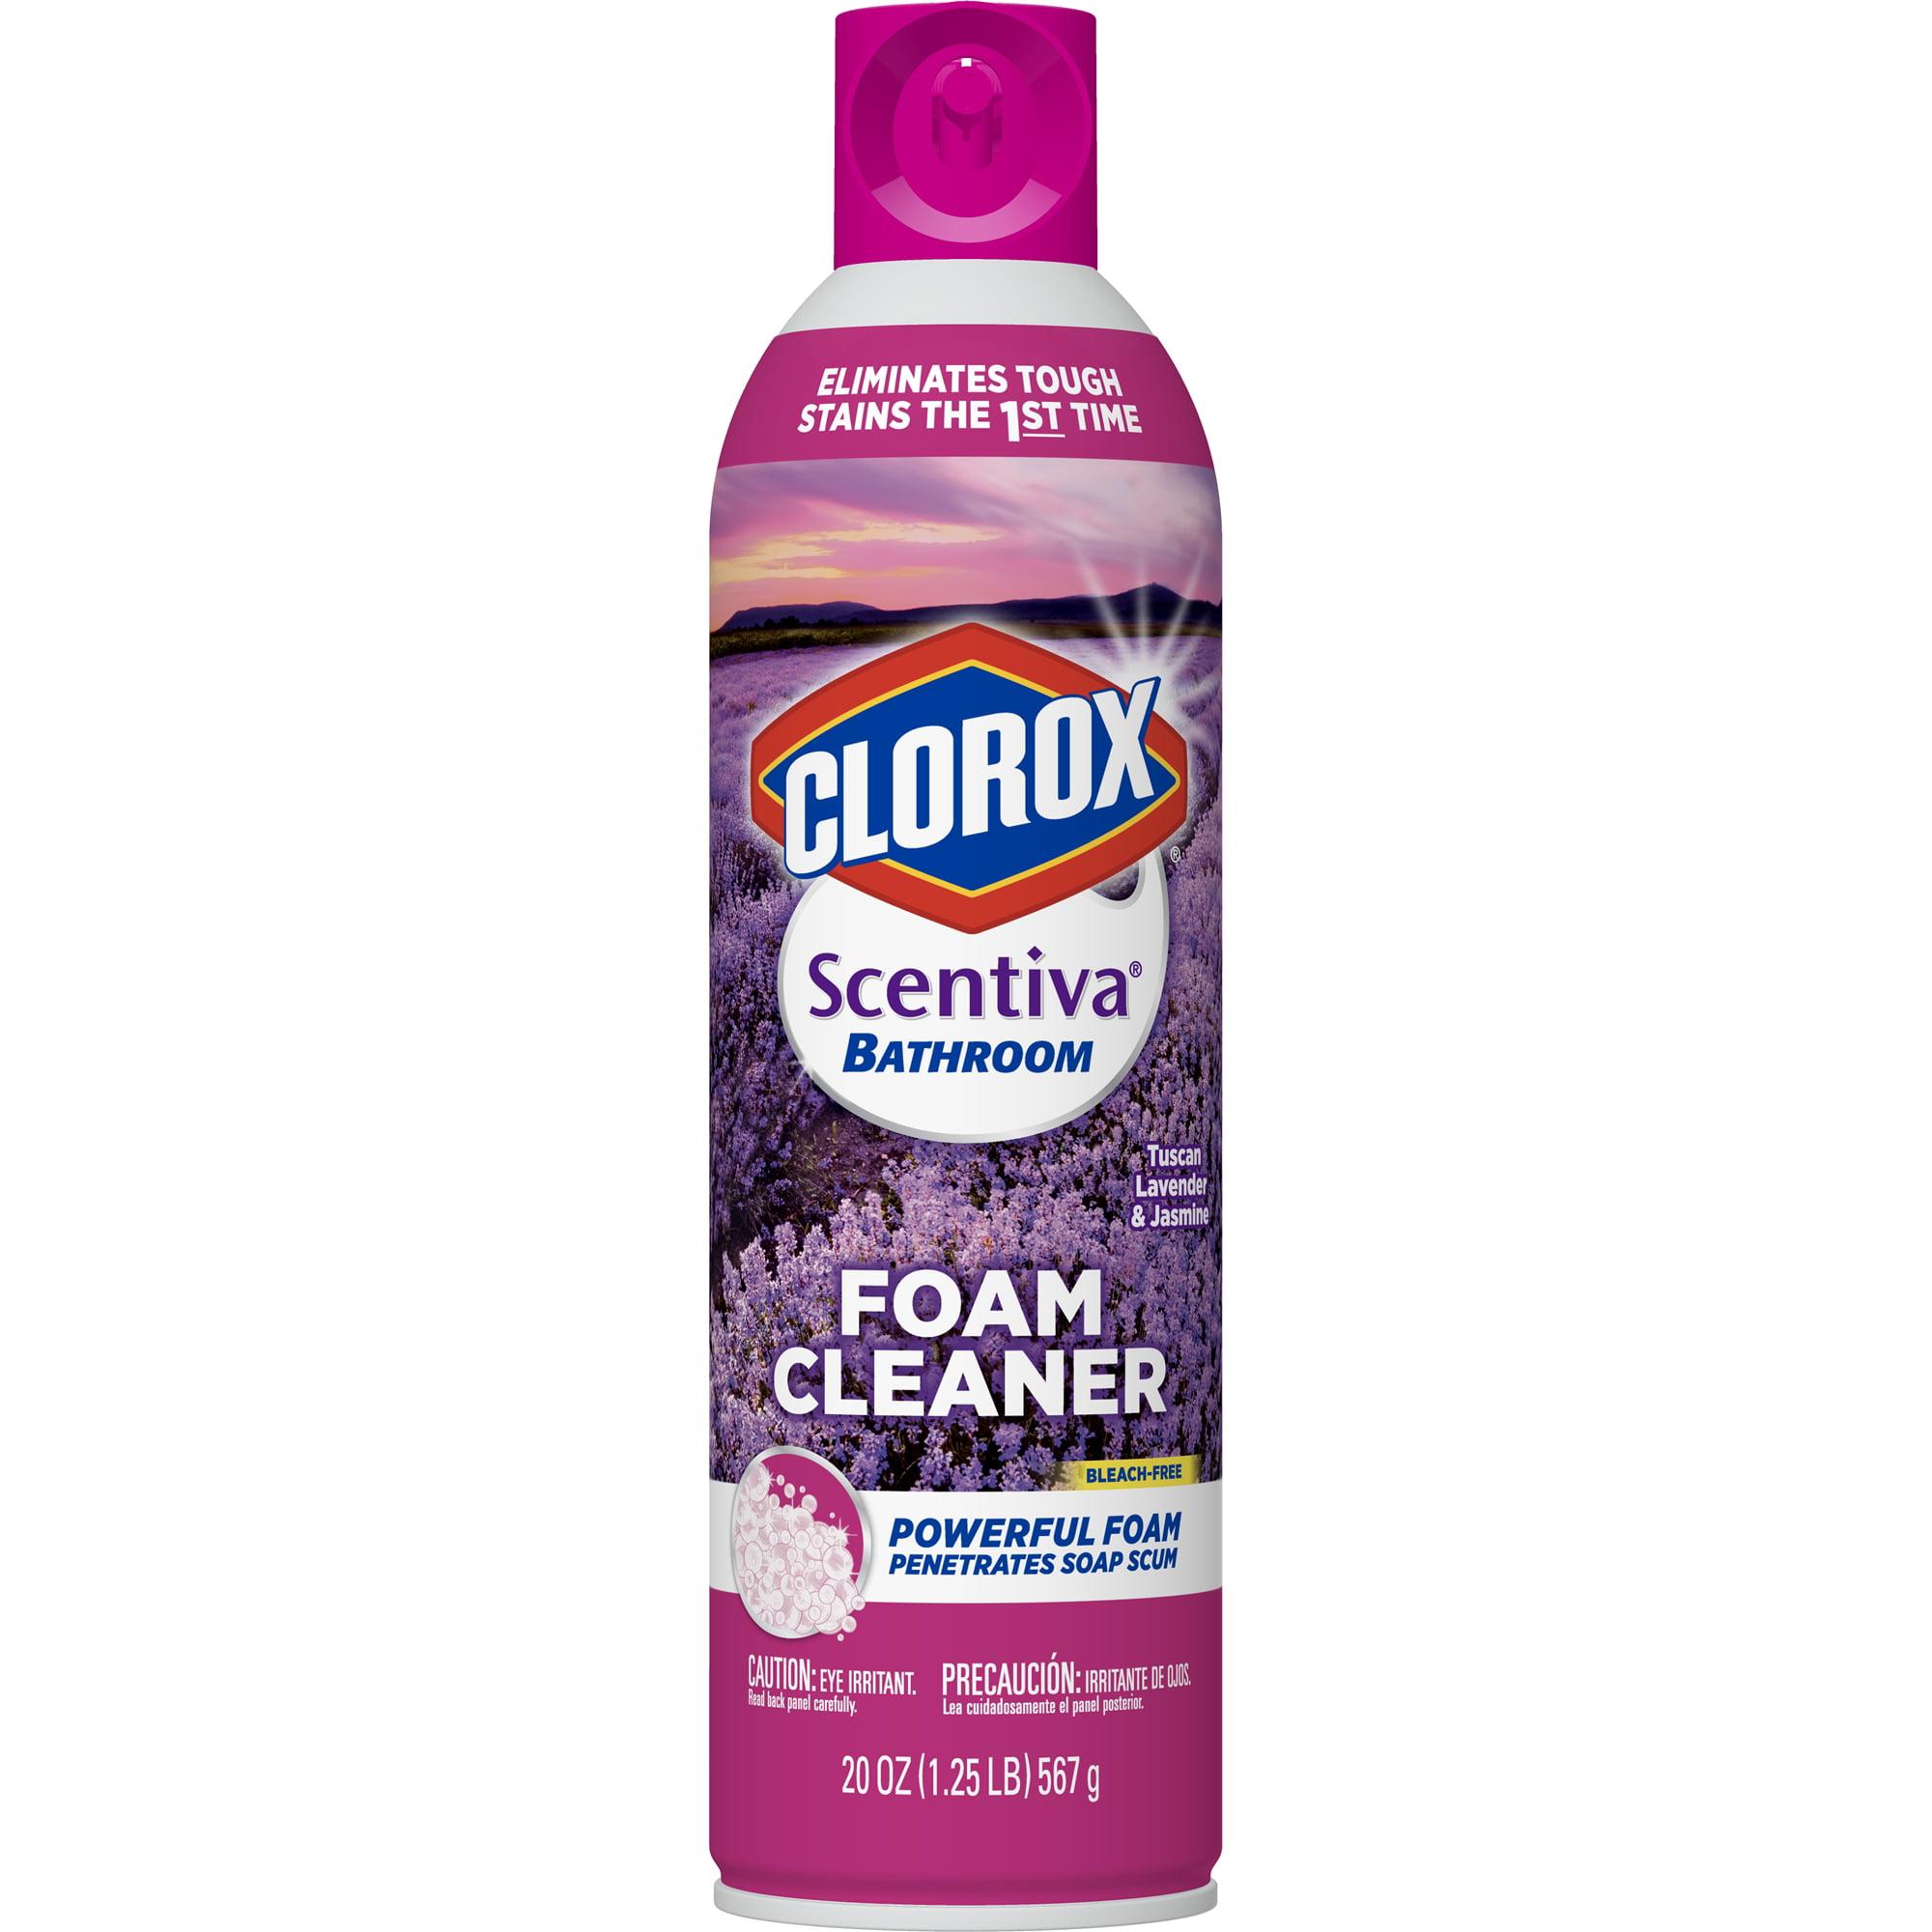 Clorox Scentiva Bathroom Foam Cleaner - Foaming Aerosol Multi-Surface Cleaner - Tuscan Lavender Jasmine - 20 oz